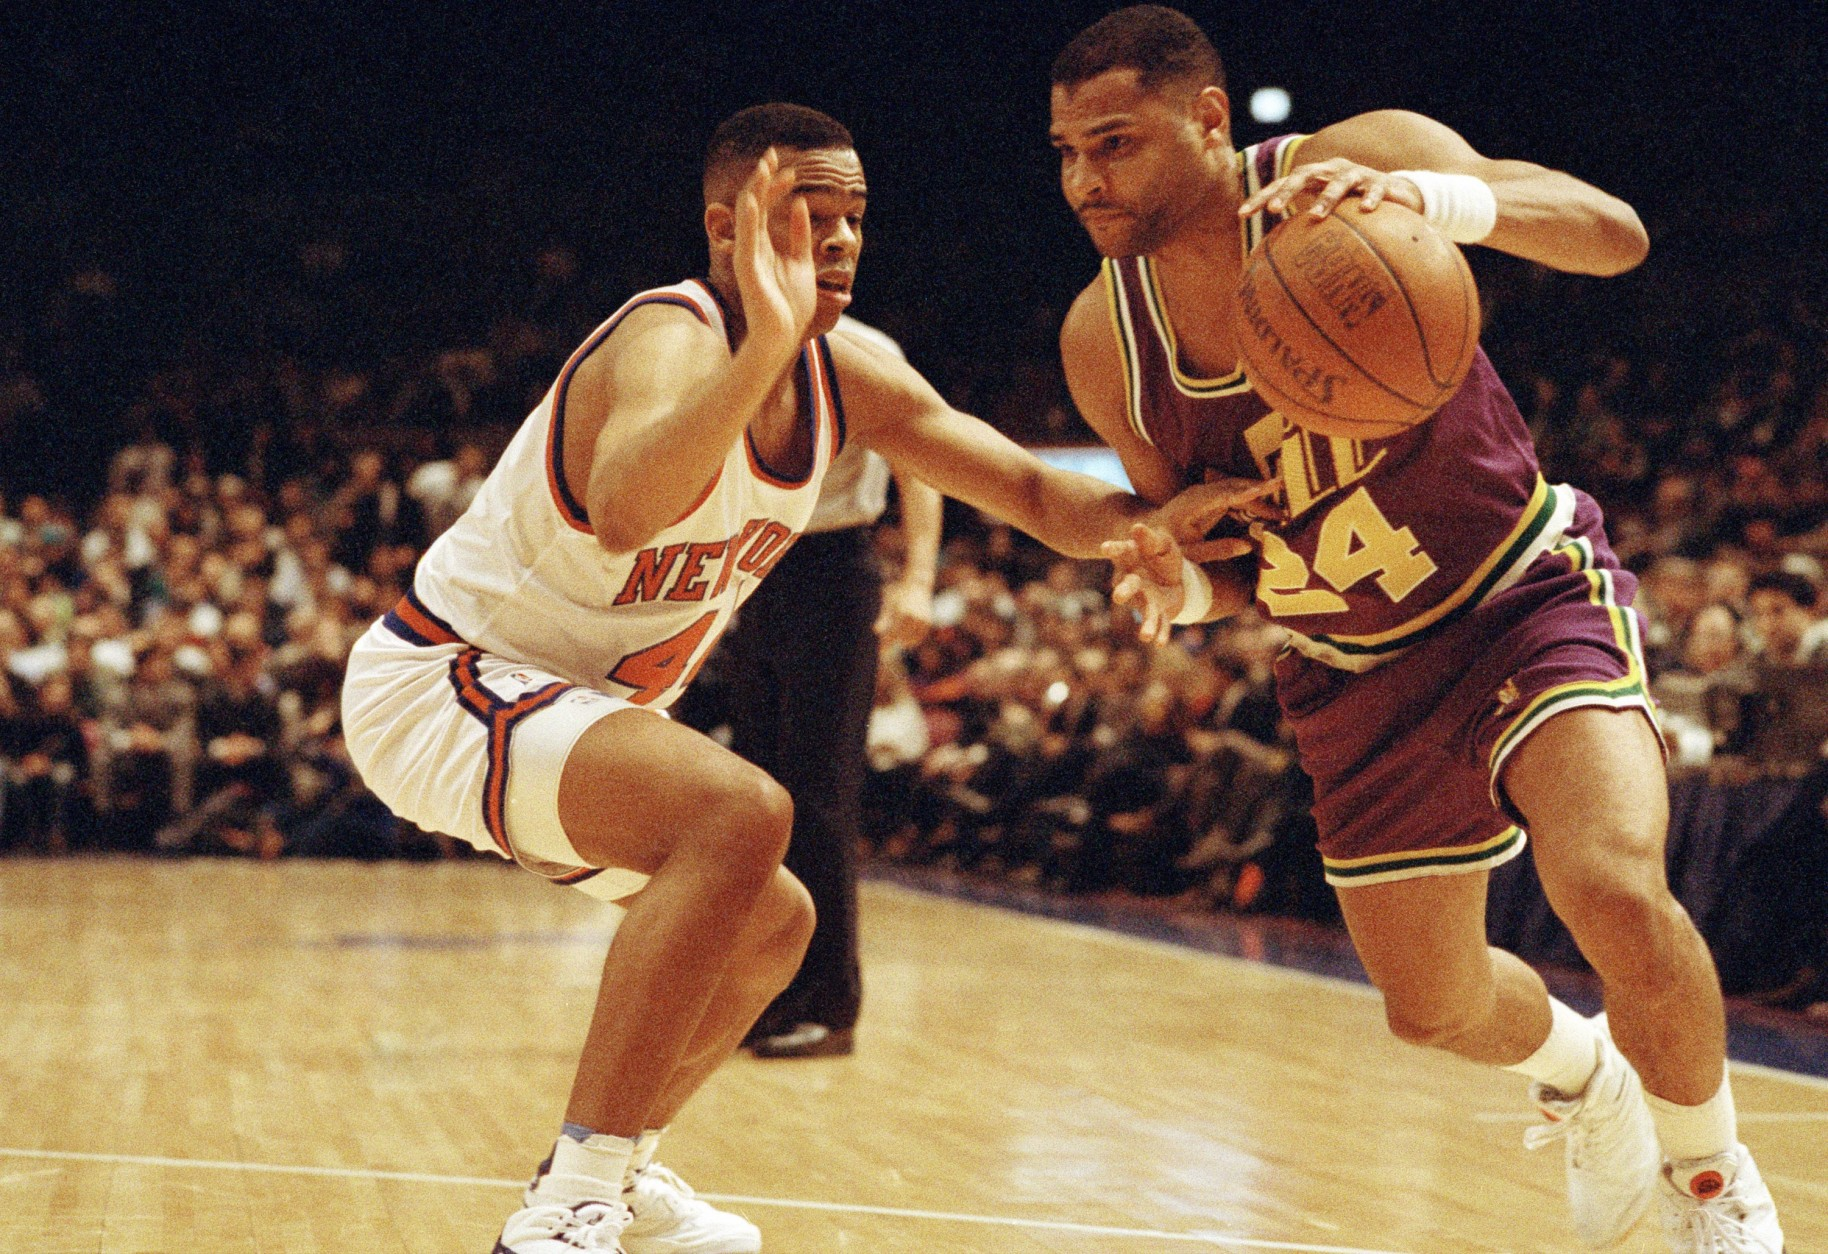 Utah Jazz player Jeff Malone, right , drives around New York Knicks player Hubert Davis during first quarter NBA action at Madison Square Garden in New York March 4, 1993. (AP Photo/Kevin Larkin)